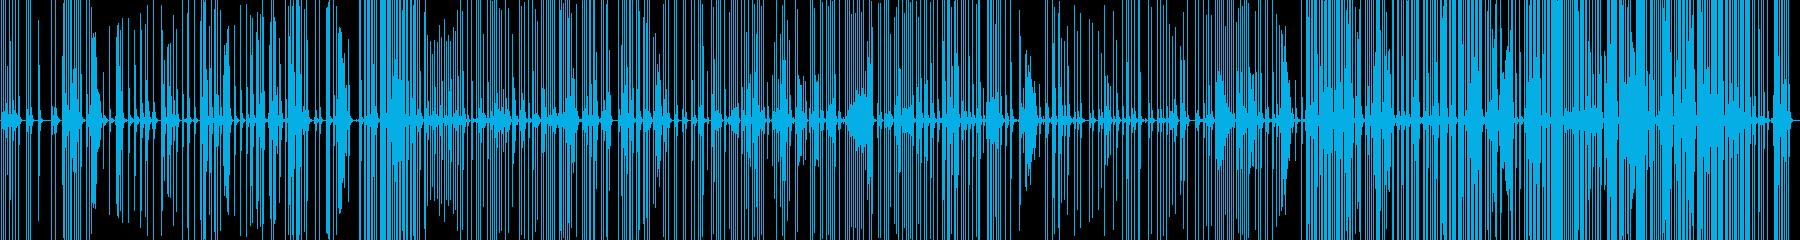 三味線185紀州道成寺1縁起絵巻安珍清姫の再生済みの波形